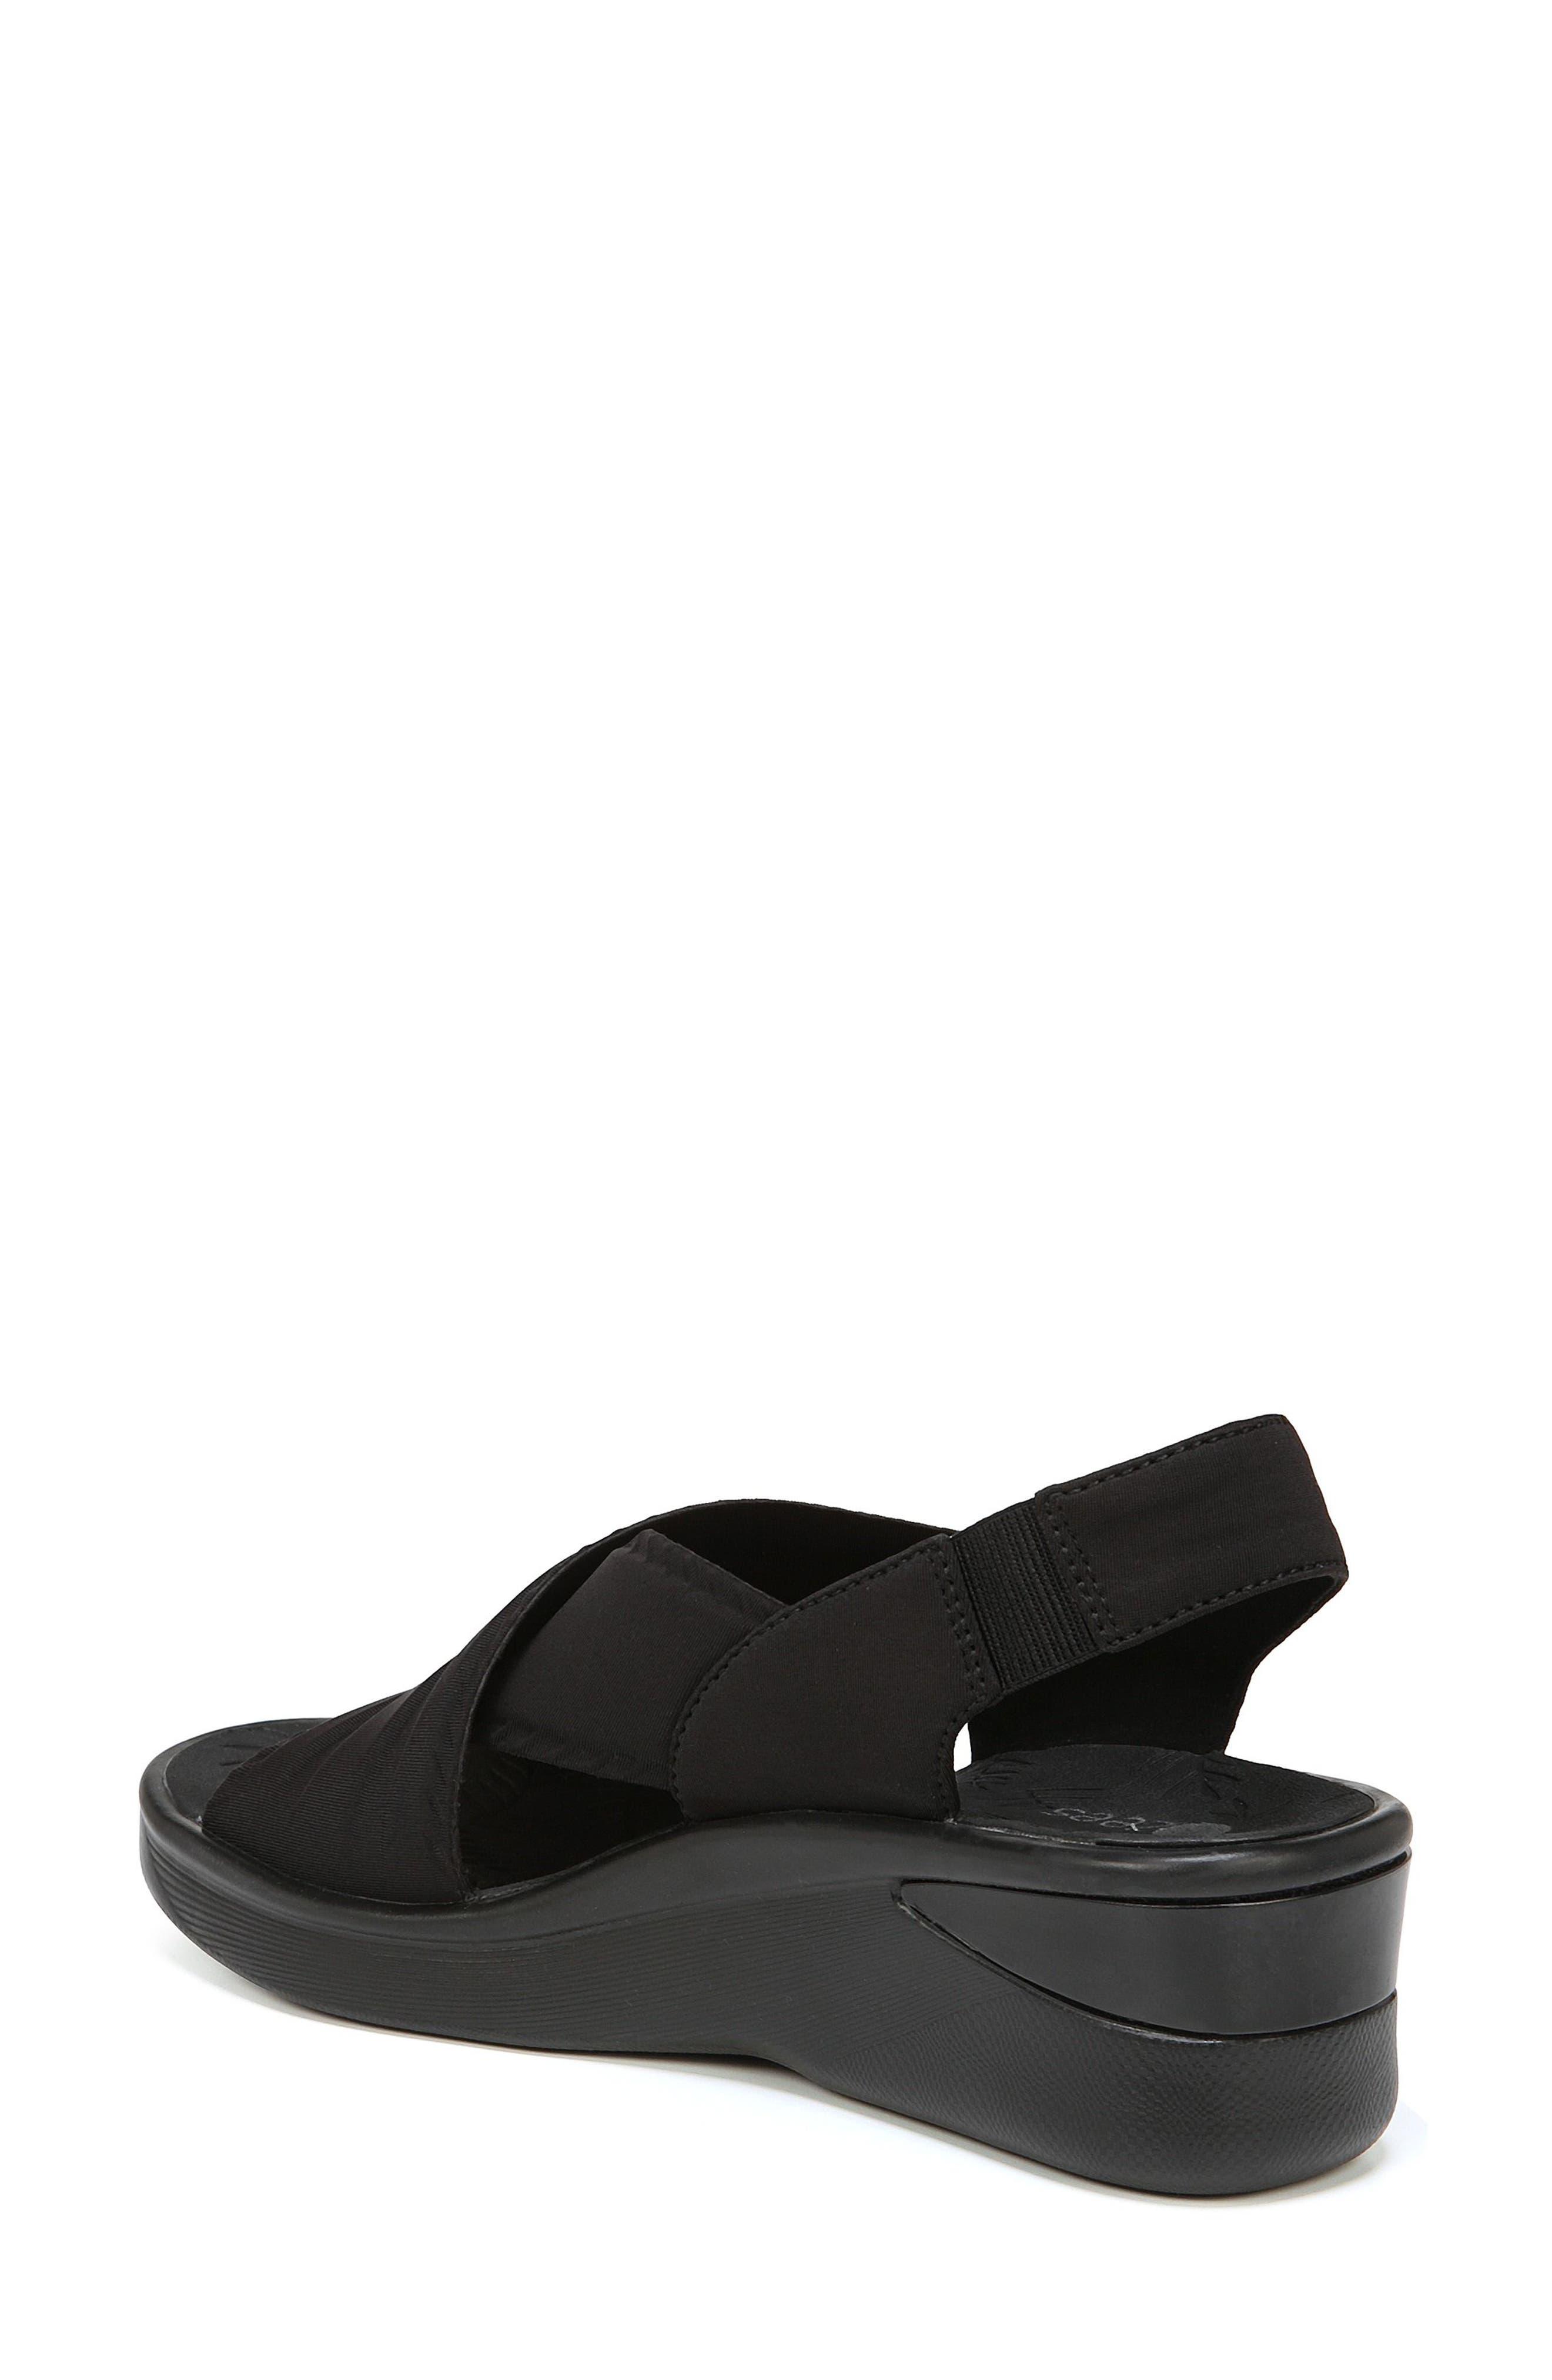 Sunset Wedge Sandal,                             Alternate thumbnail 2, color,                             BLACK FABRIC